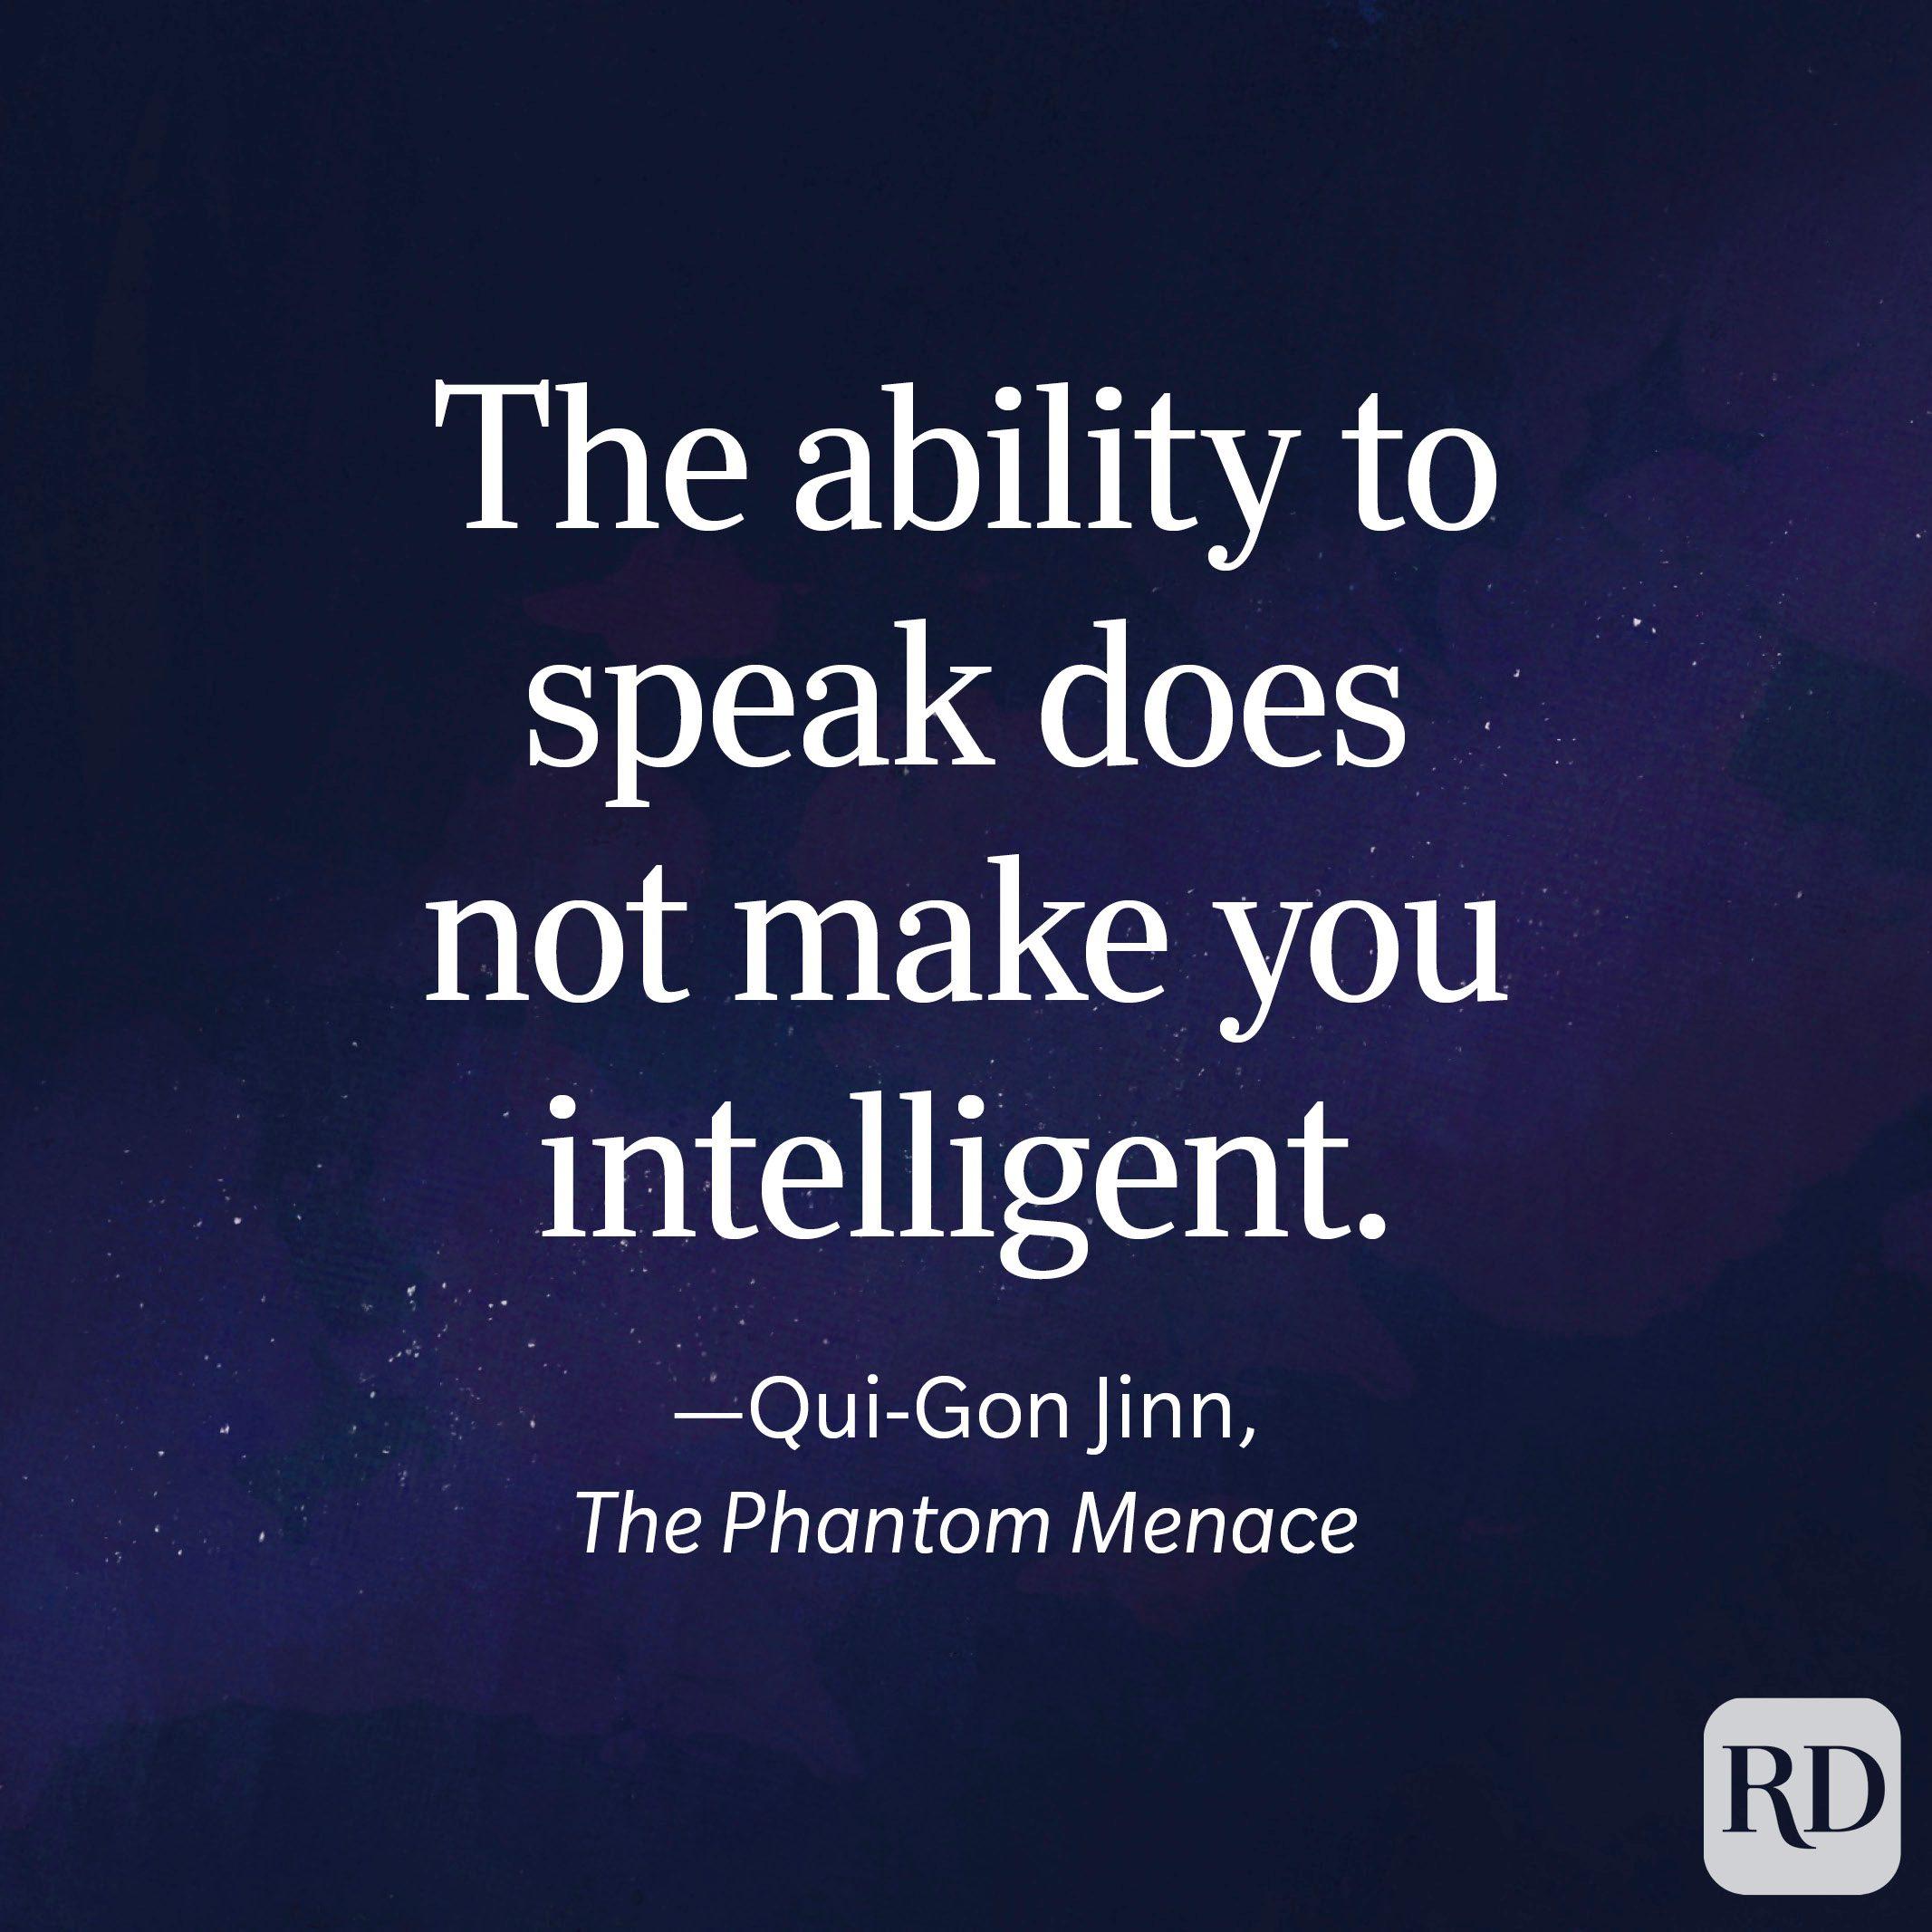 """The ability to speak does not make you intelligent."" —Qui-Gon Jinn, The Phantom Menace"